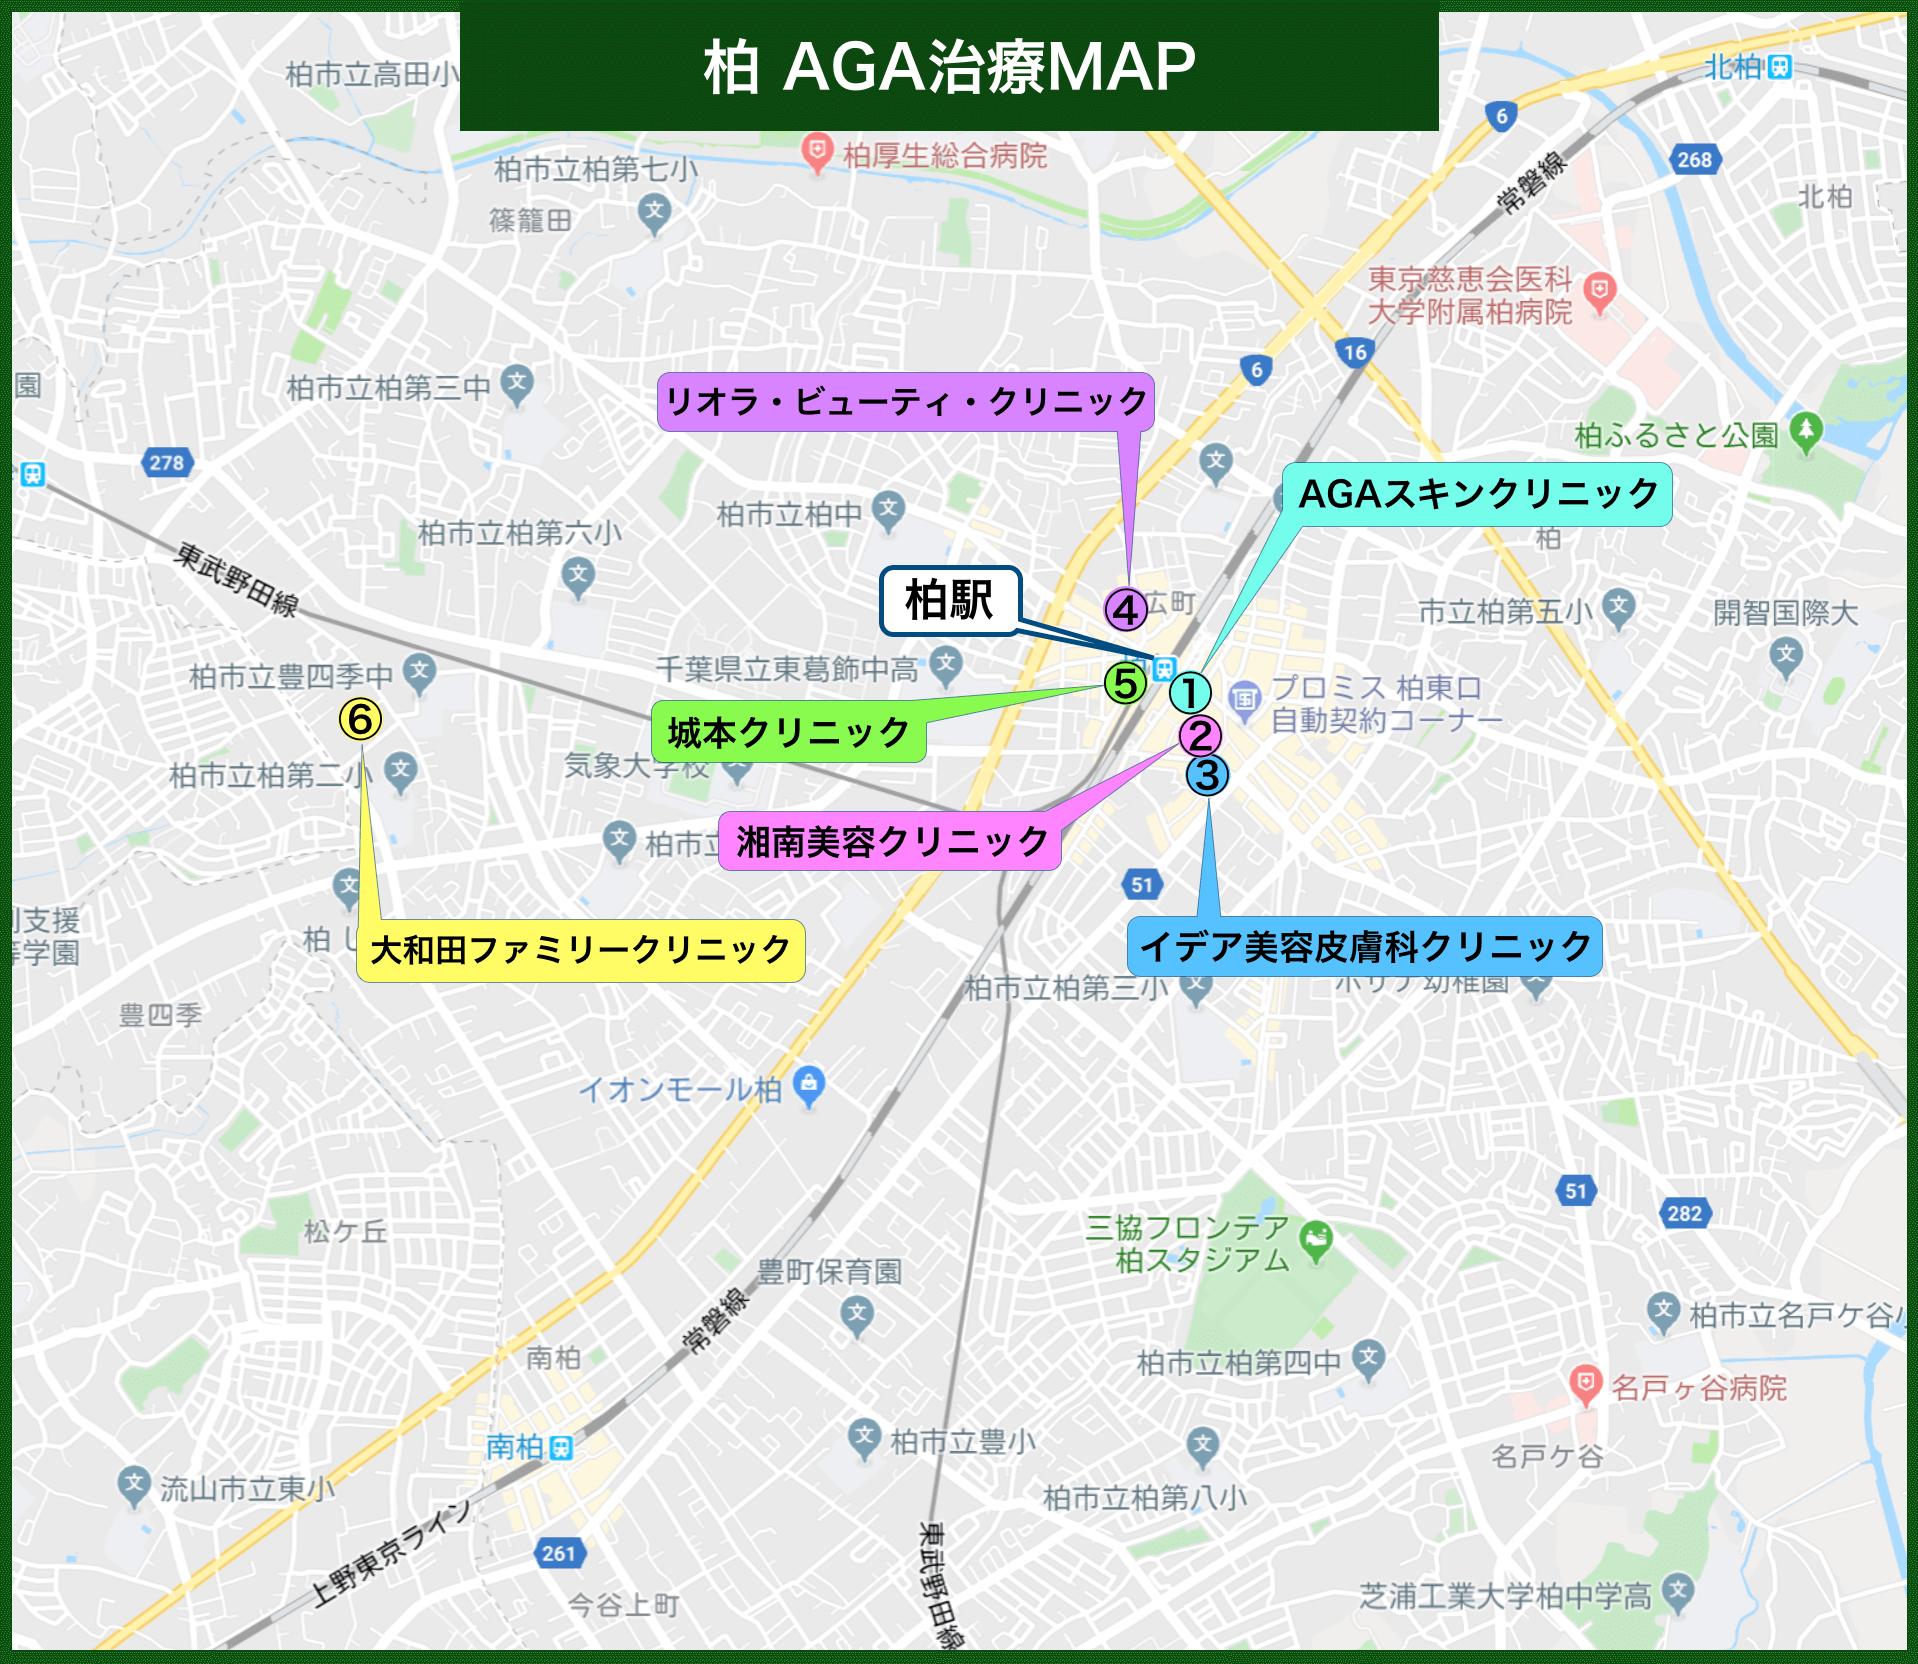 柏 AGA治療MAP(2020年版)